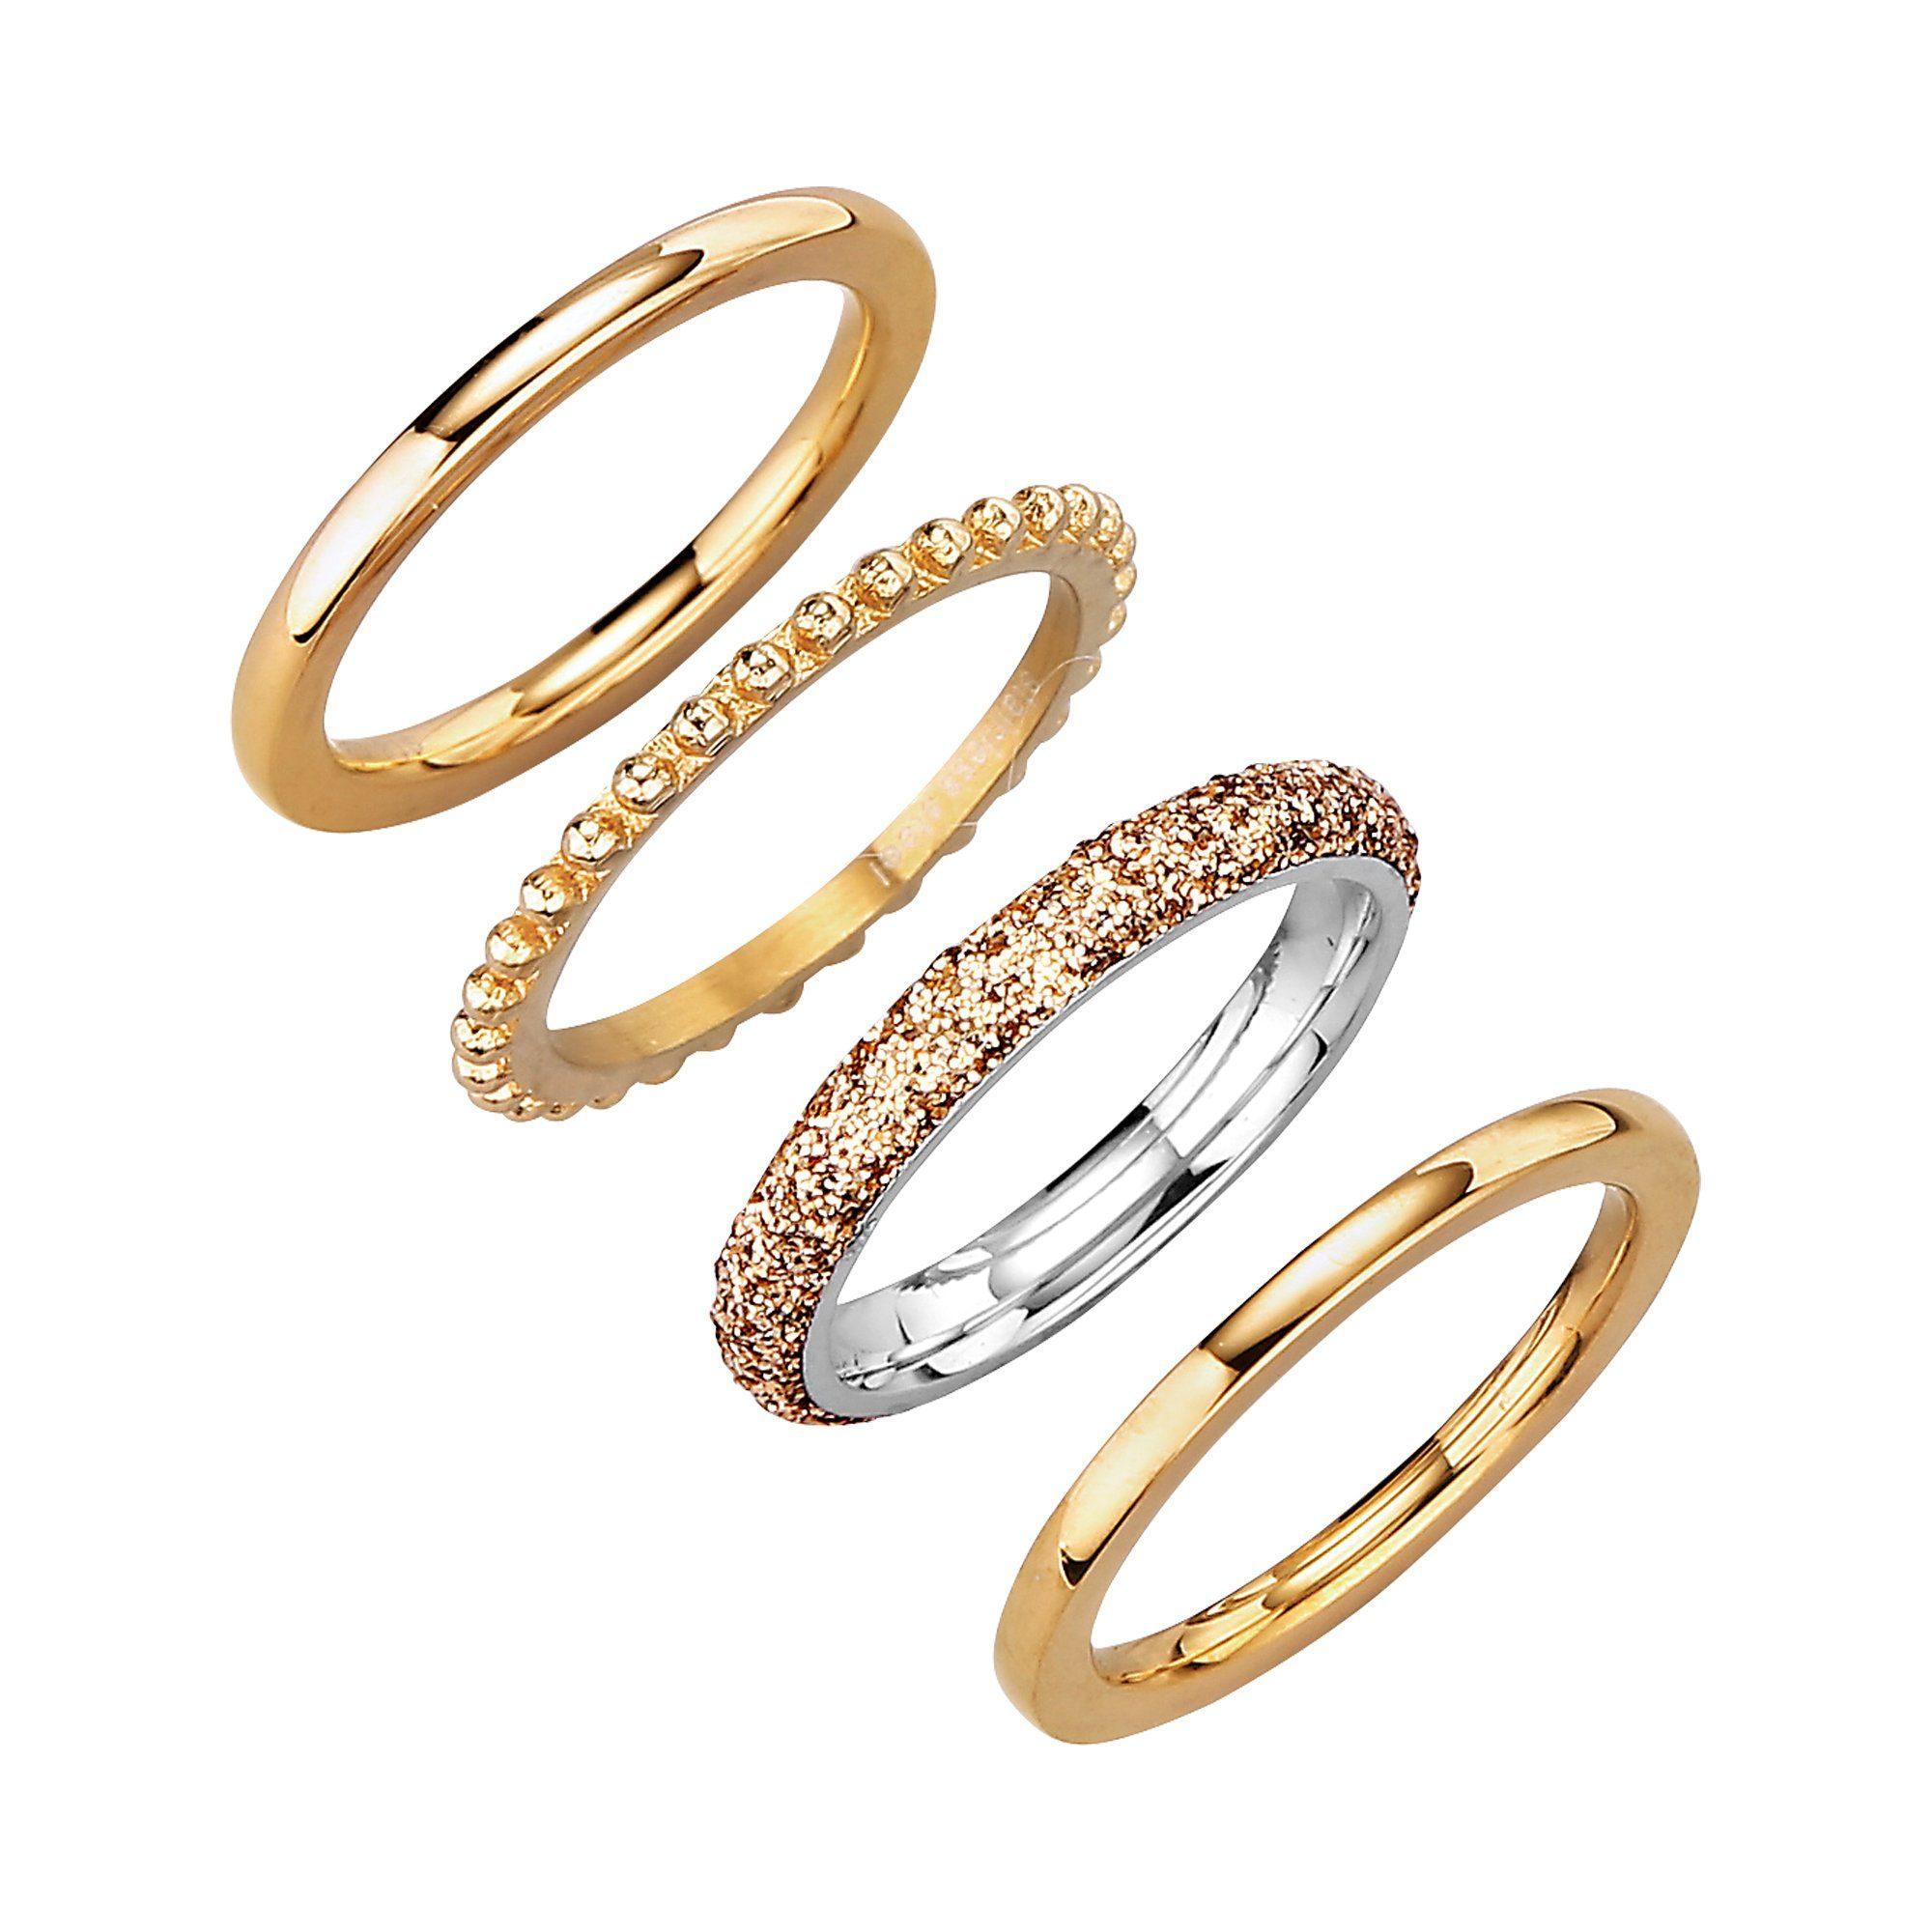 Jacques Lemans Ring-Set Edelstahl vergoldet | Schmuck > Ringe > Goldringe | Gelb | Jacques Lemans